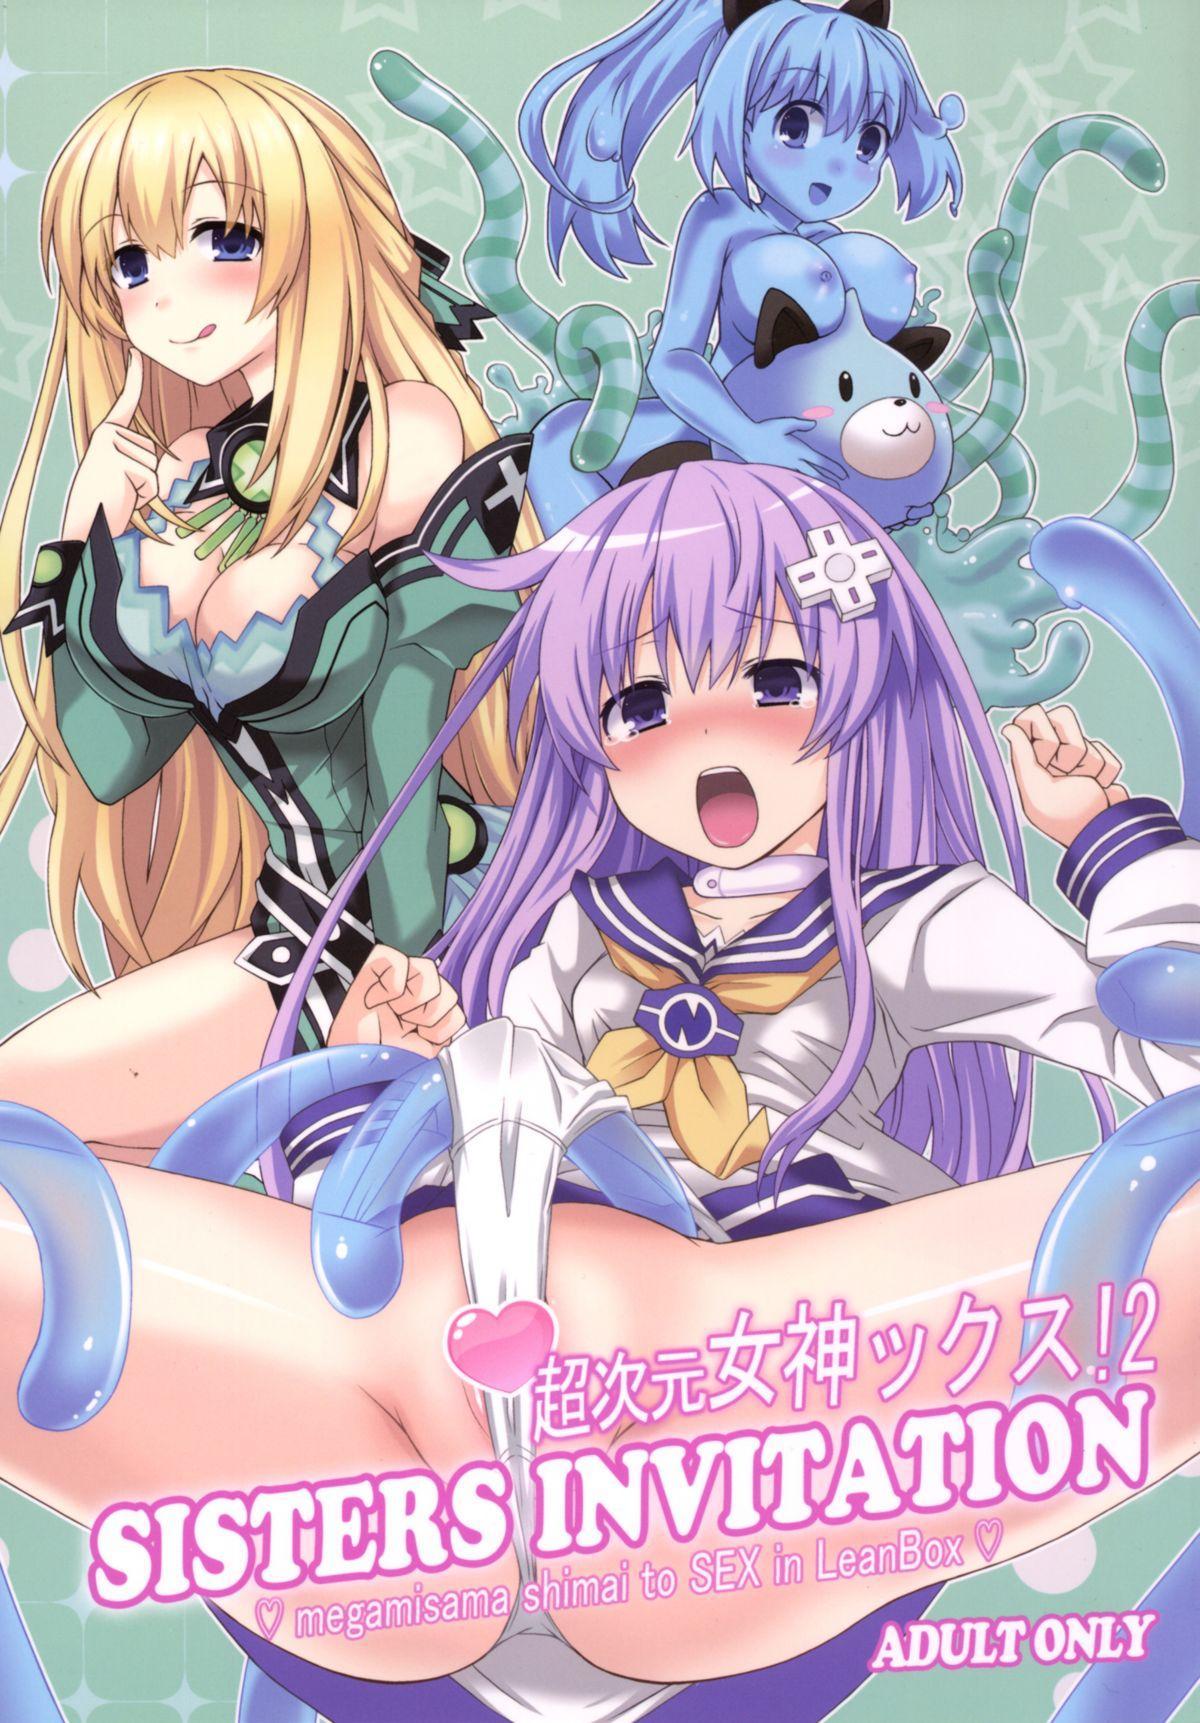 Hentai hyperdimension neptunia Hyperdimension Neptunia